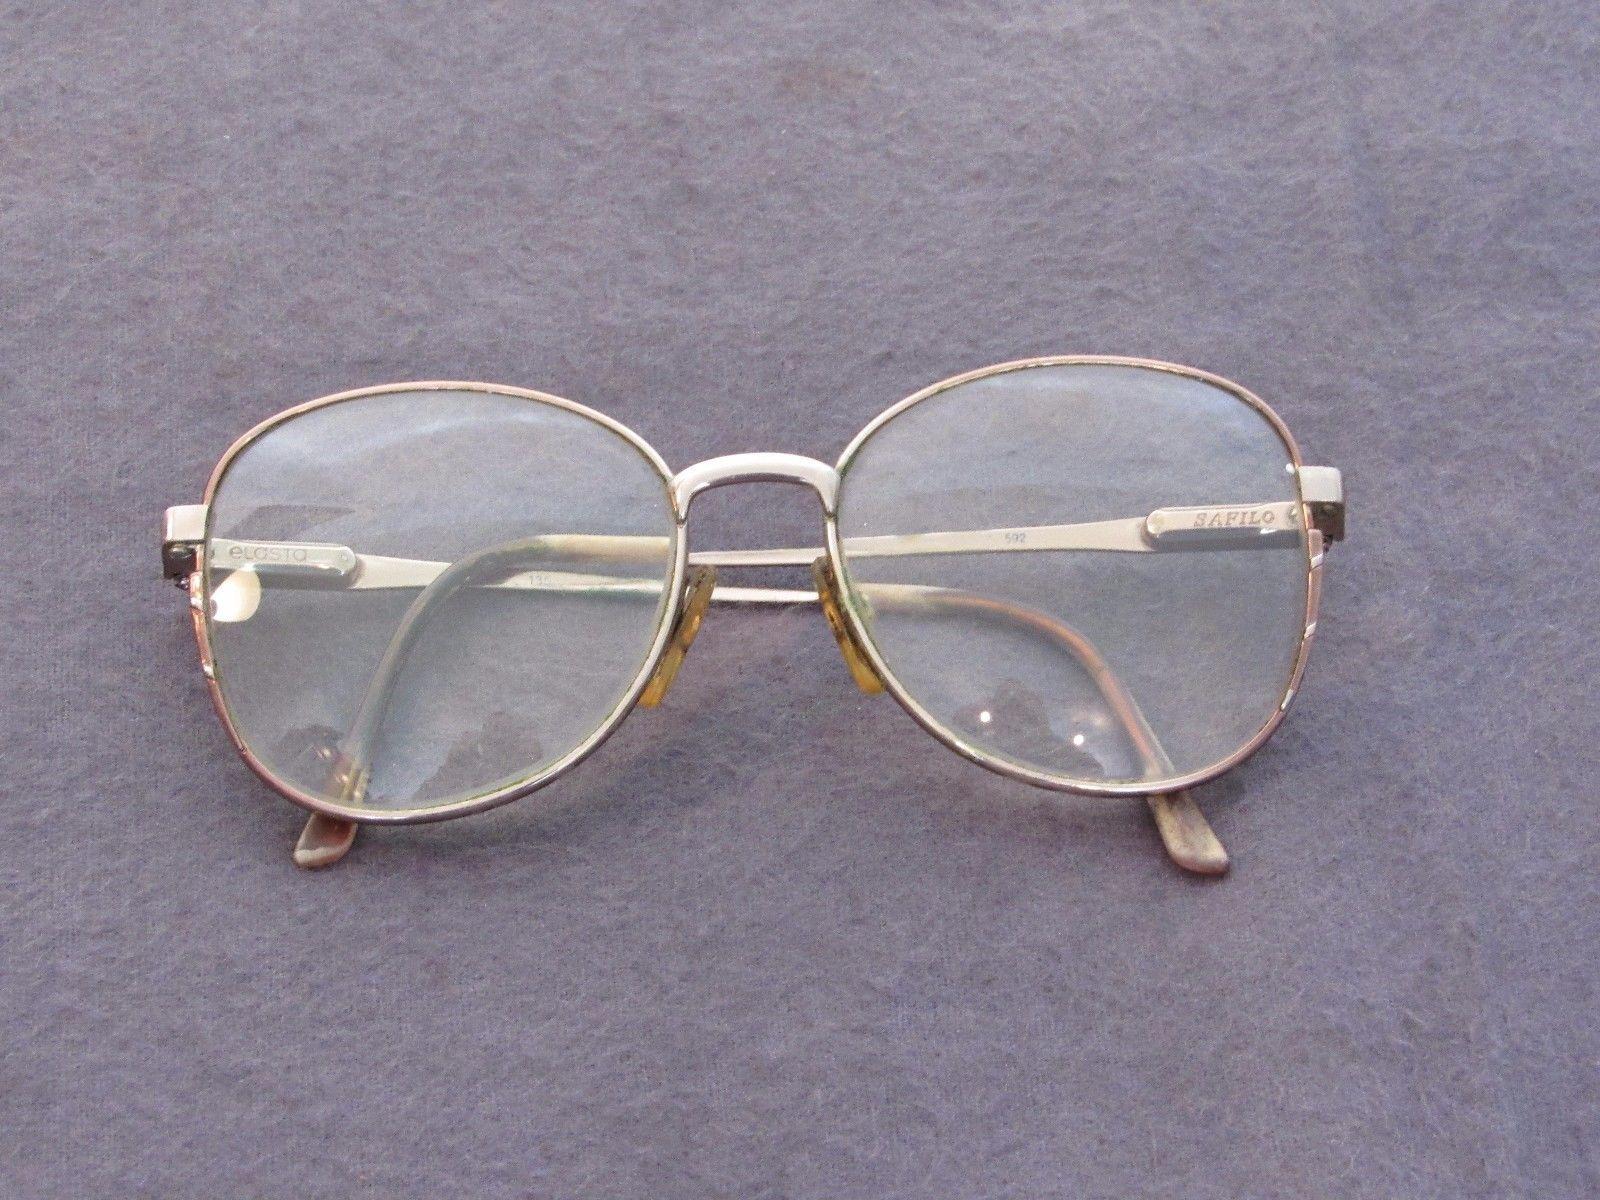 Prop Elosto Safilo Vtg Full Rim Metal Eyewear Retro Eyeglasses Glasses Frames